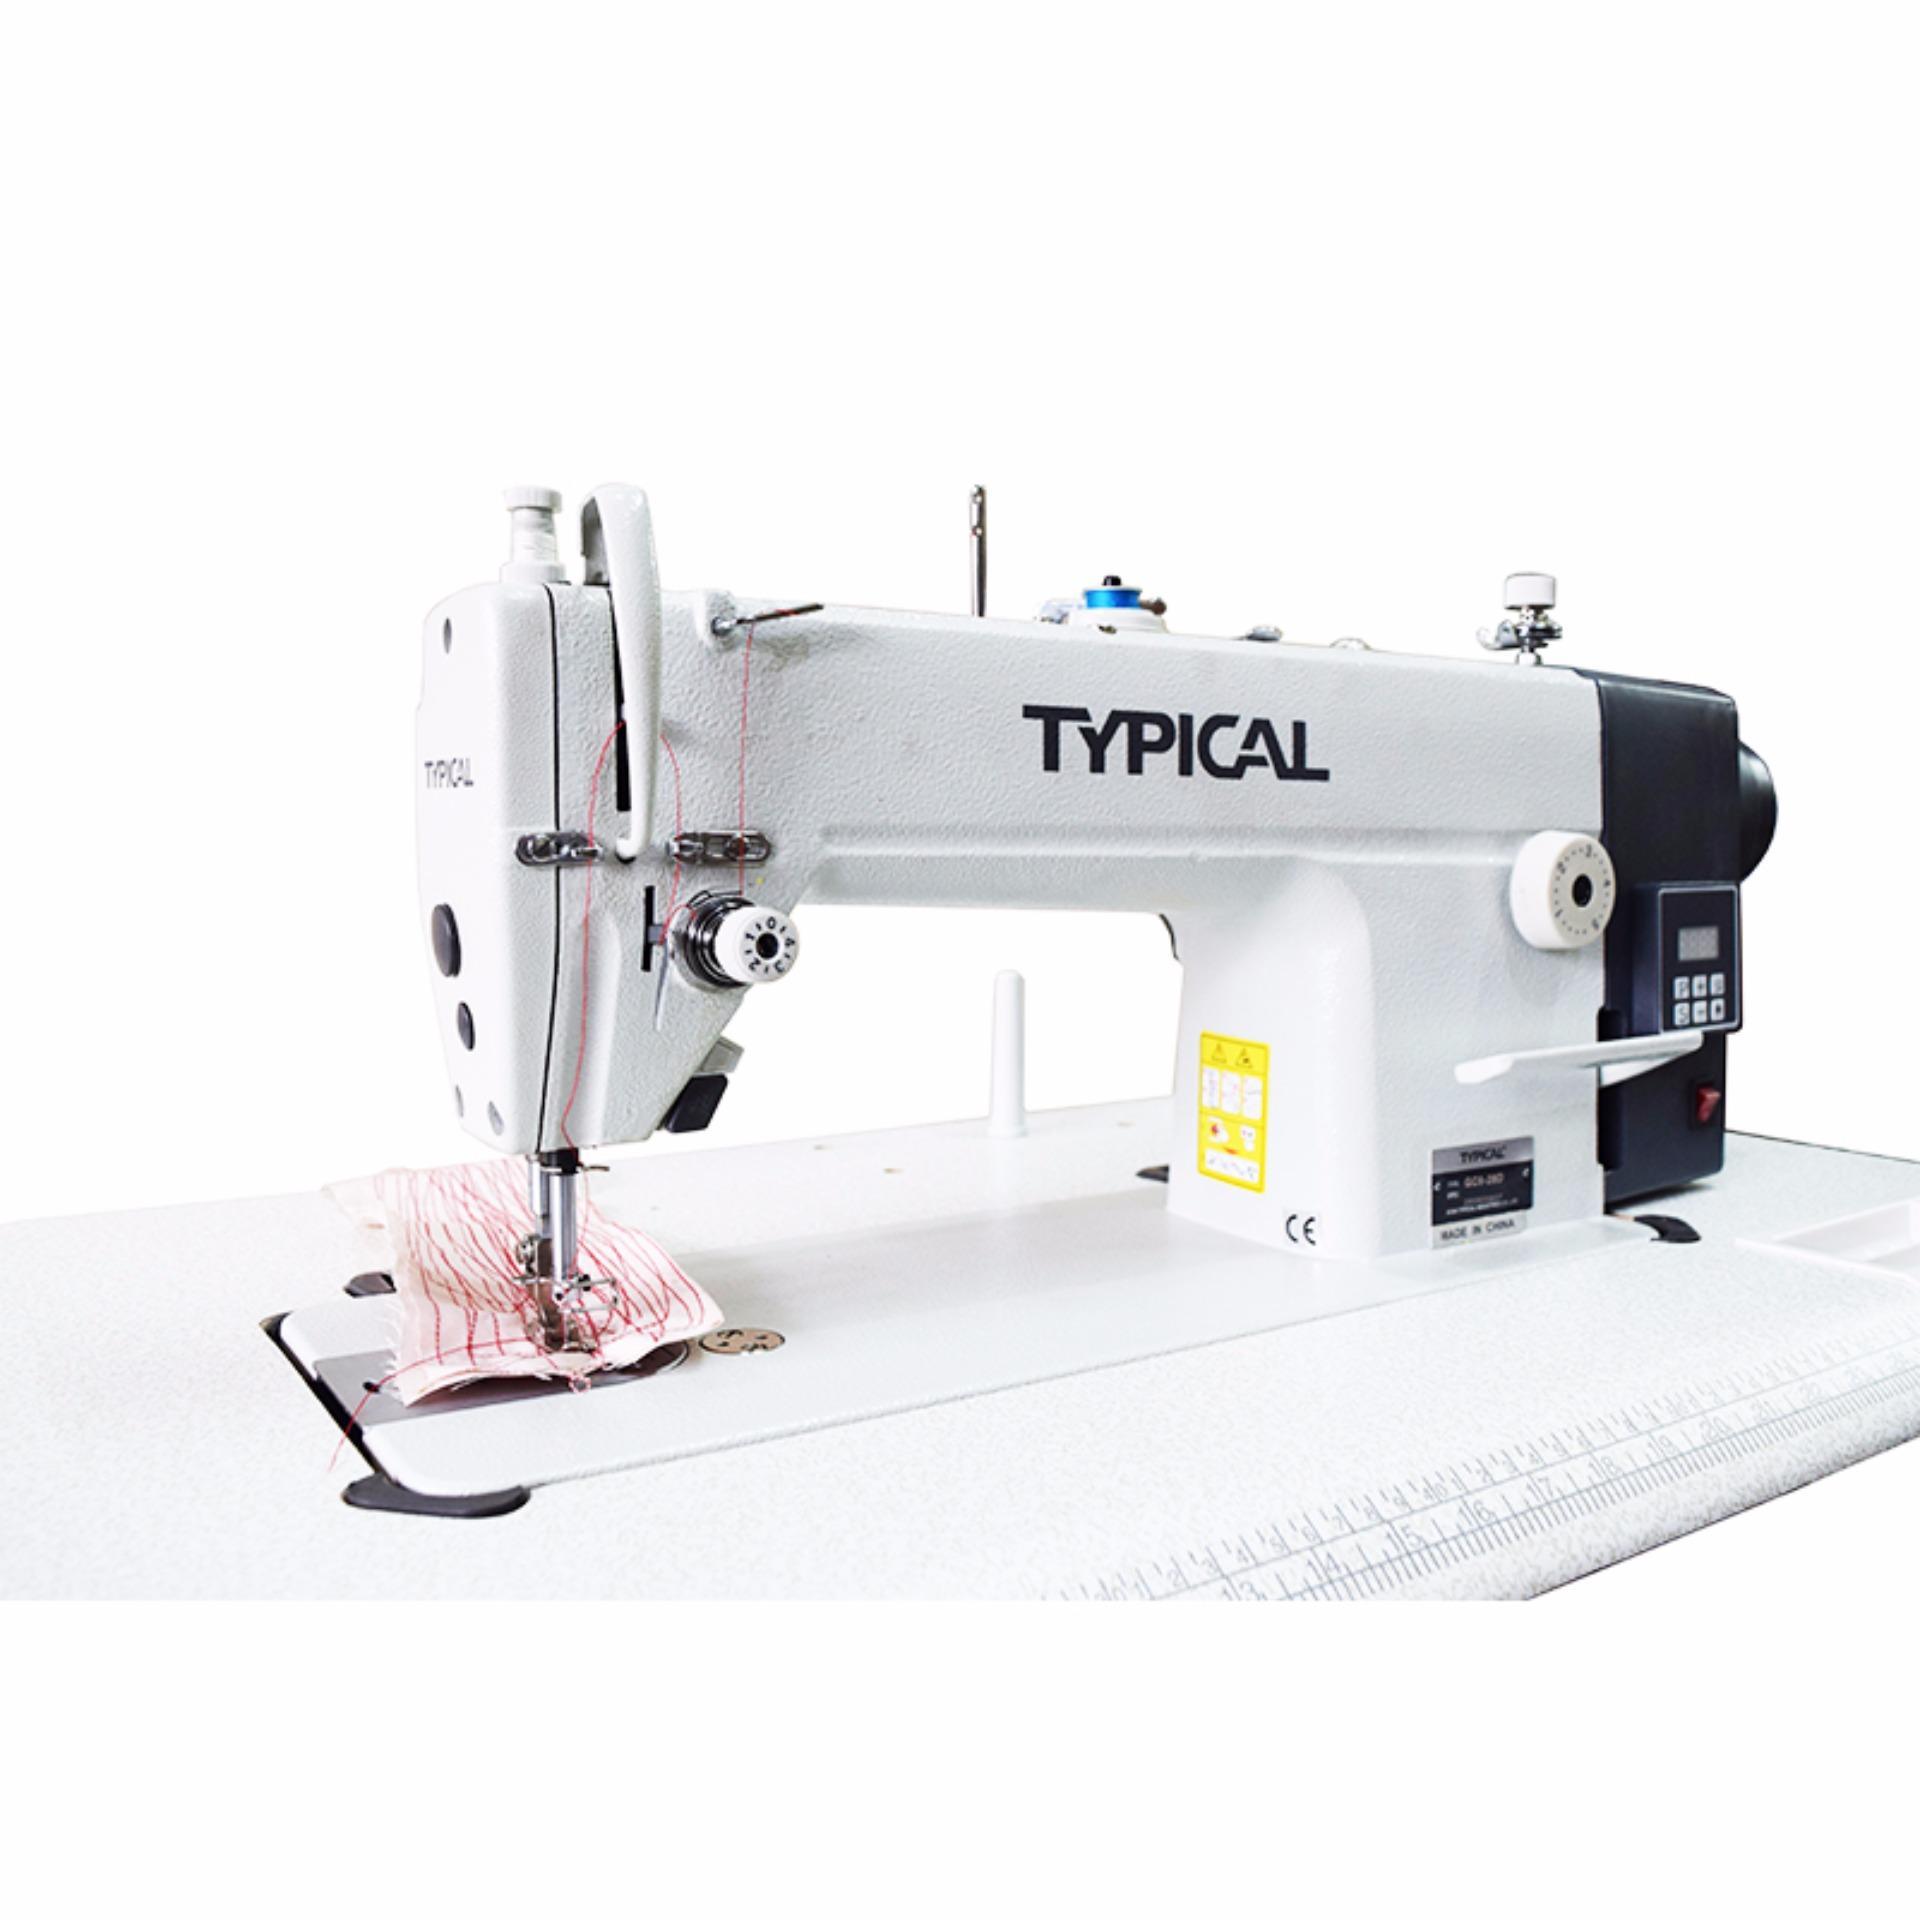 TYPICAL GC 6-28D Servo Motor Mesin Jahit Industrial